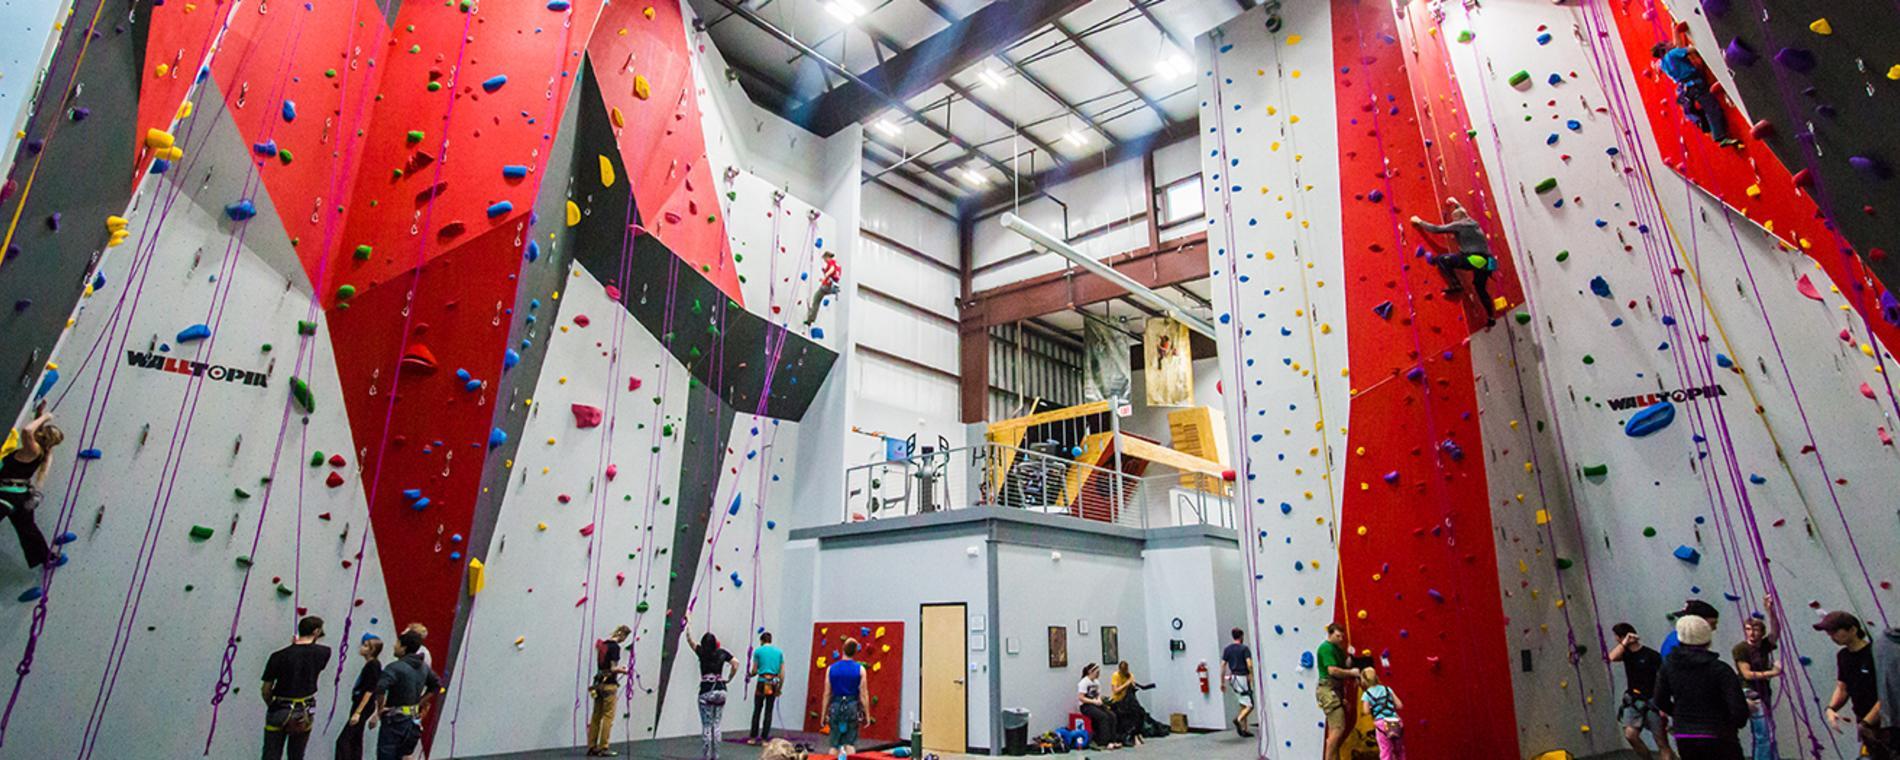 Bliss full wall & climbers